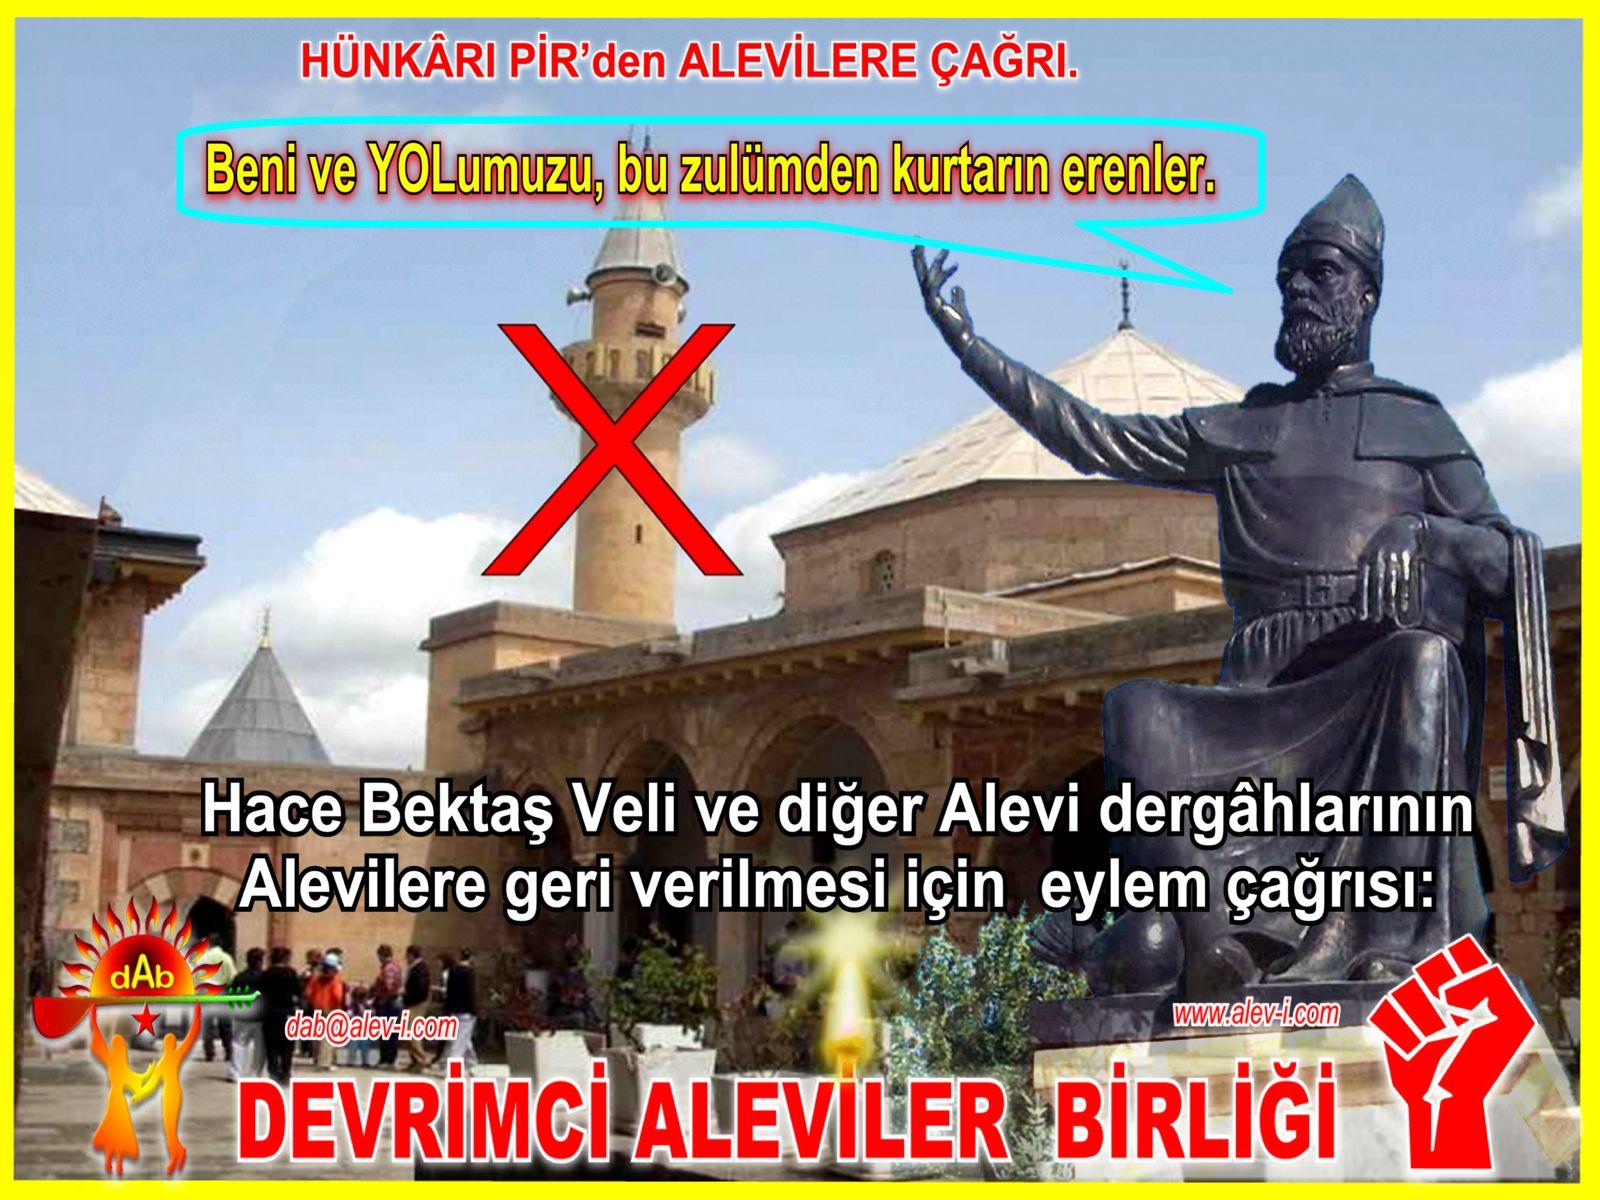 HBV CAMI beni kurtarin dergah hbv cagri 2 Aleviler kizilbas pir sultan Alevi cem Devrimci DAB